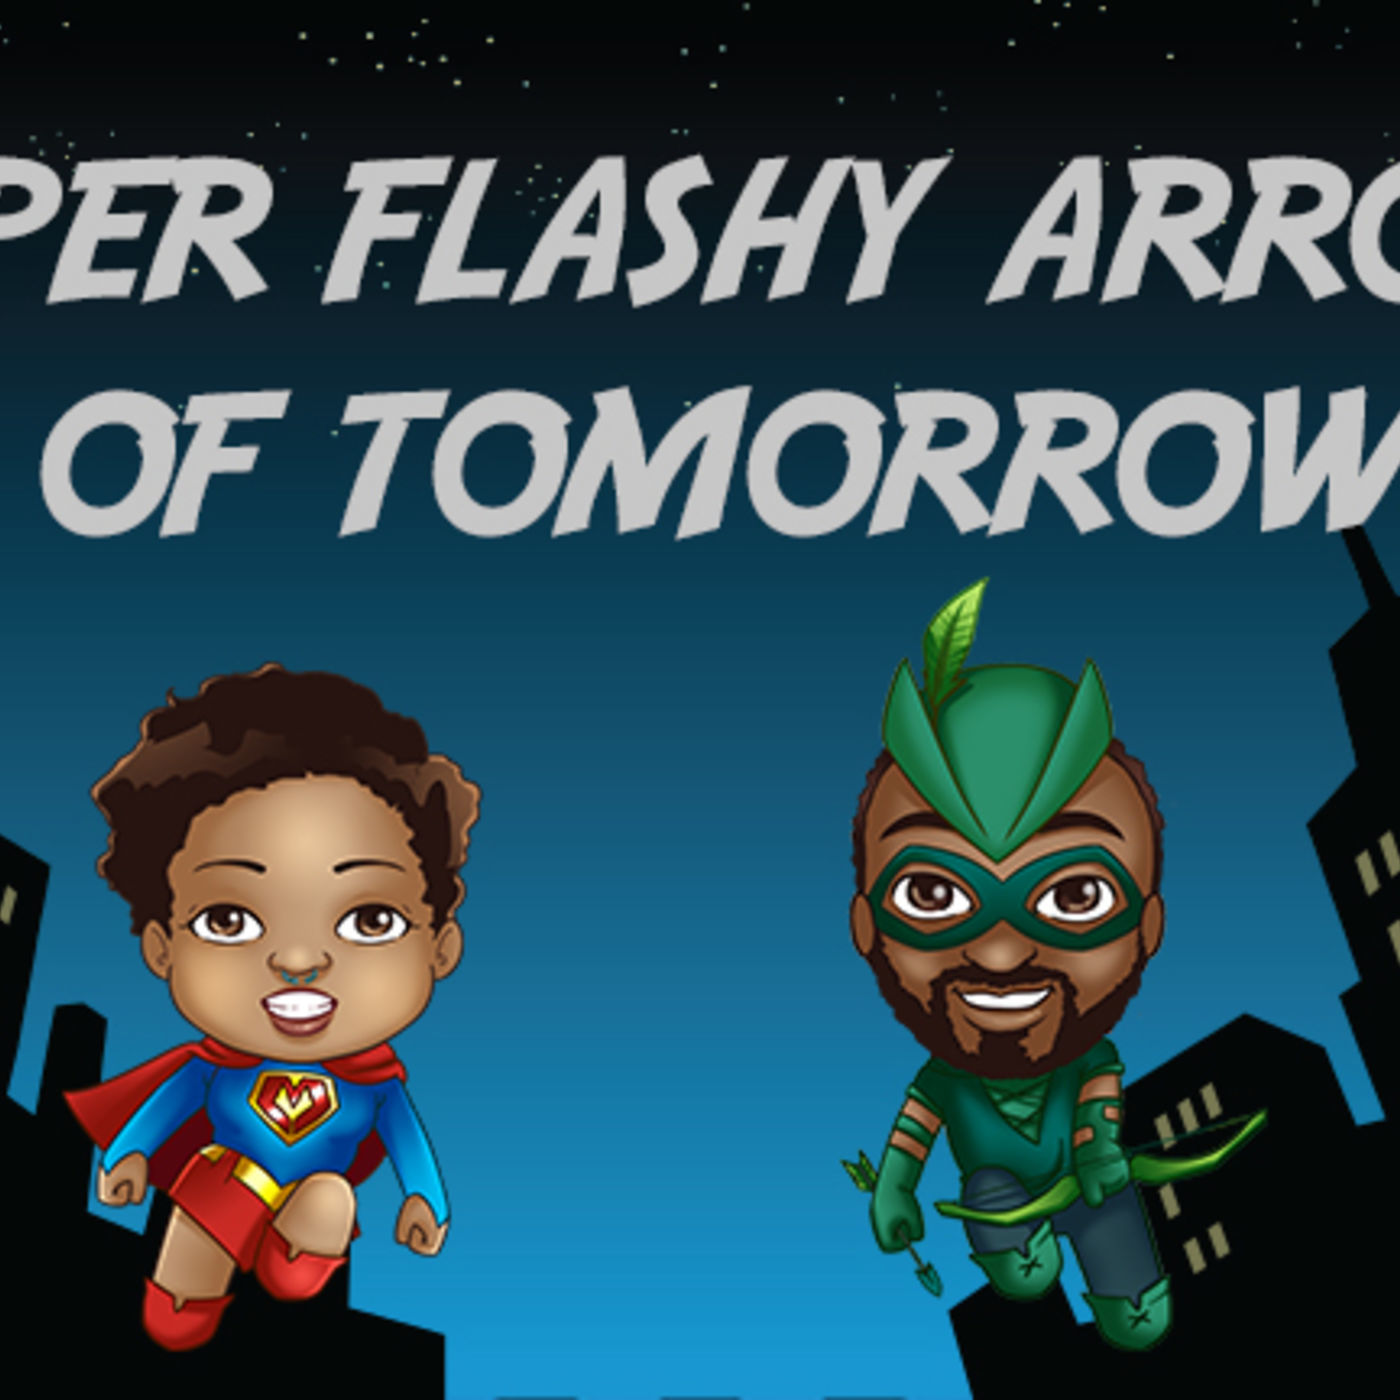 Super Flashy Arrow of Tomorrow